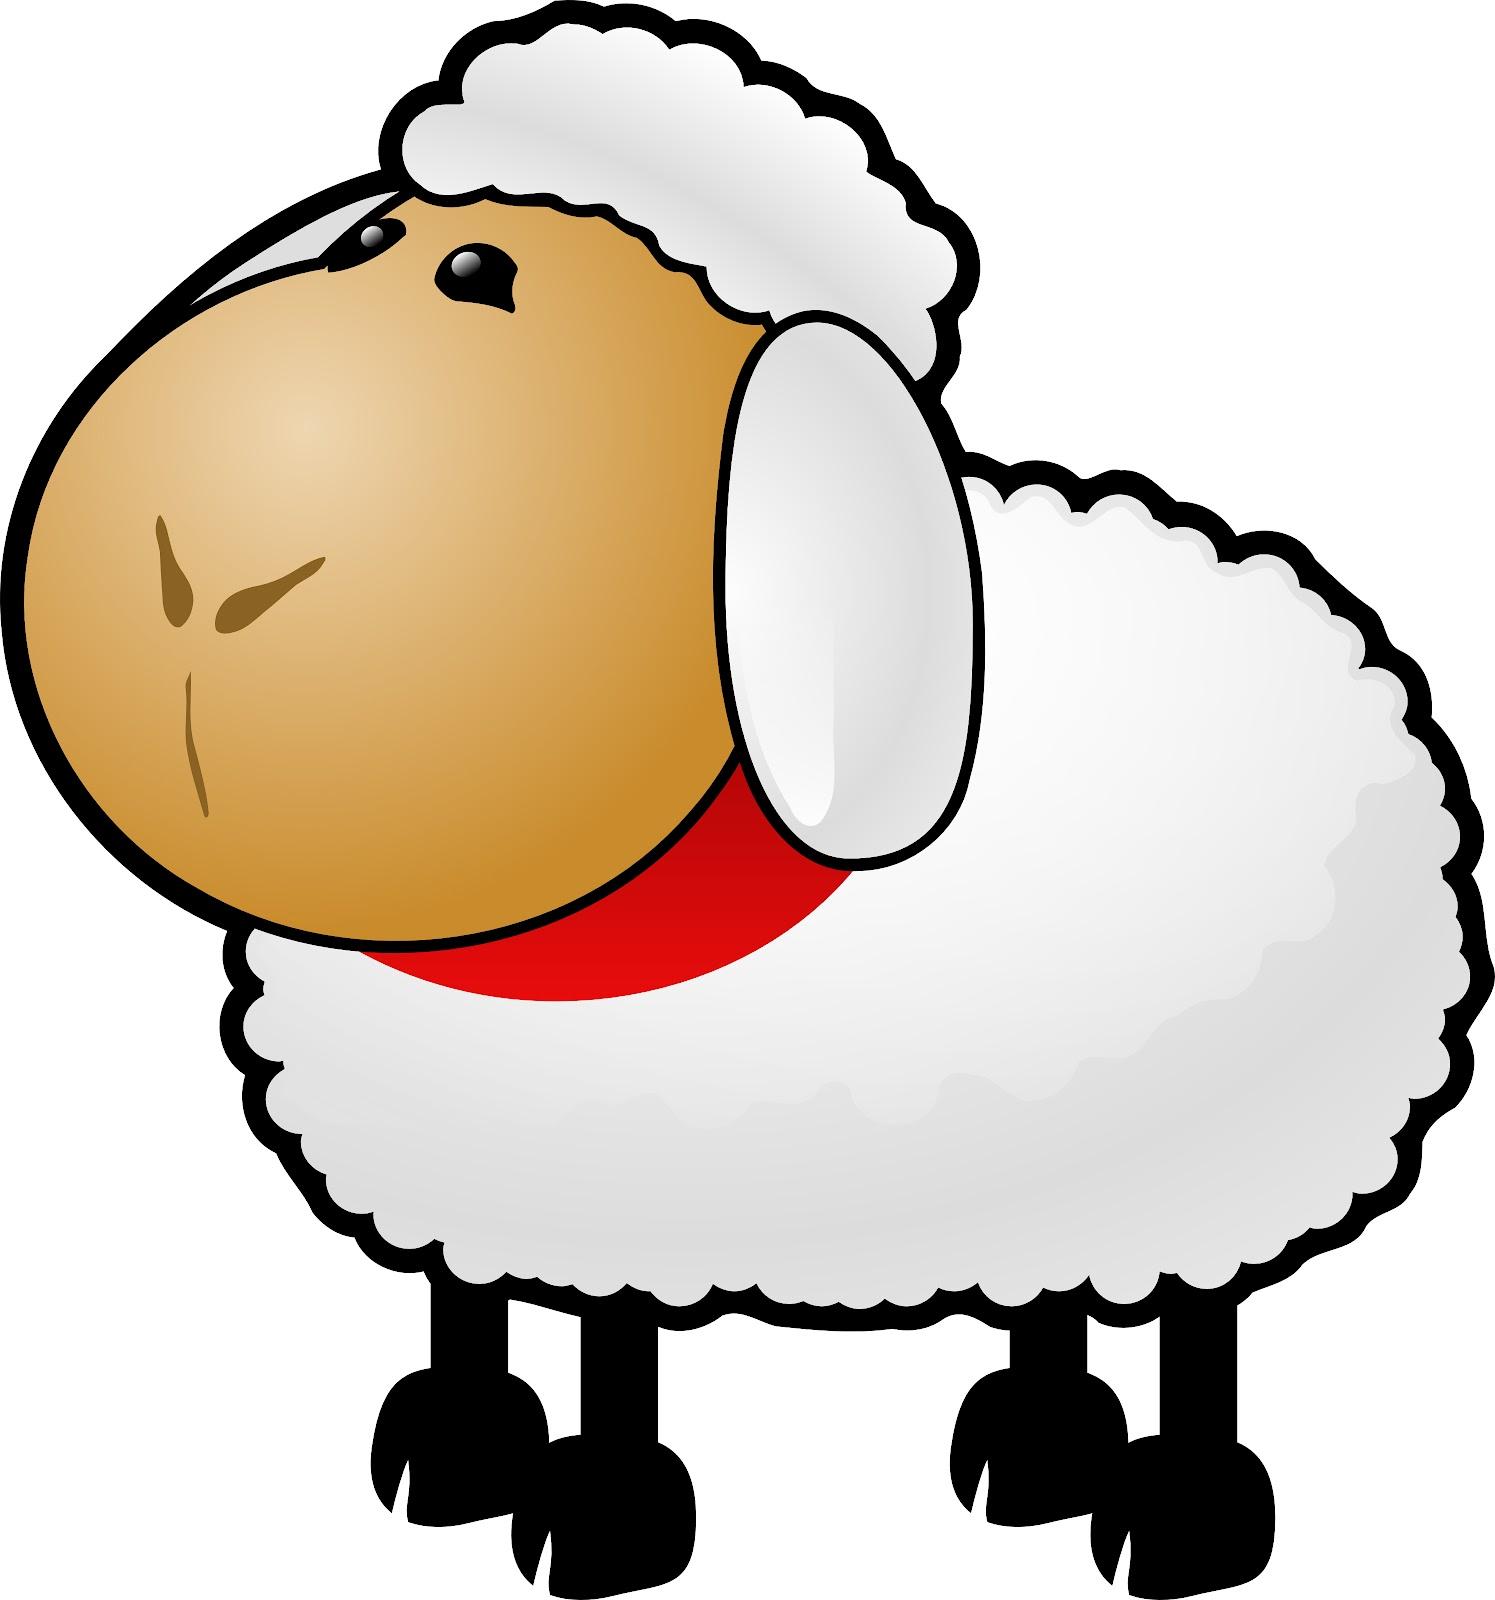 Farm Animals clipart Baby%20farm%20animal%20clipart Clipart Clipart Images Animal